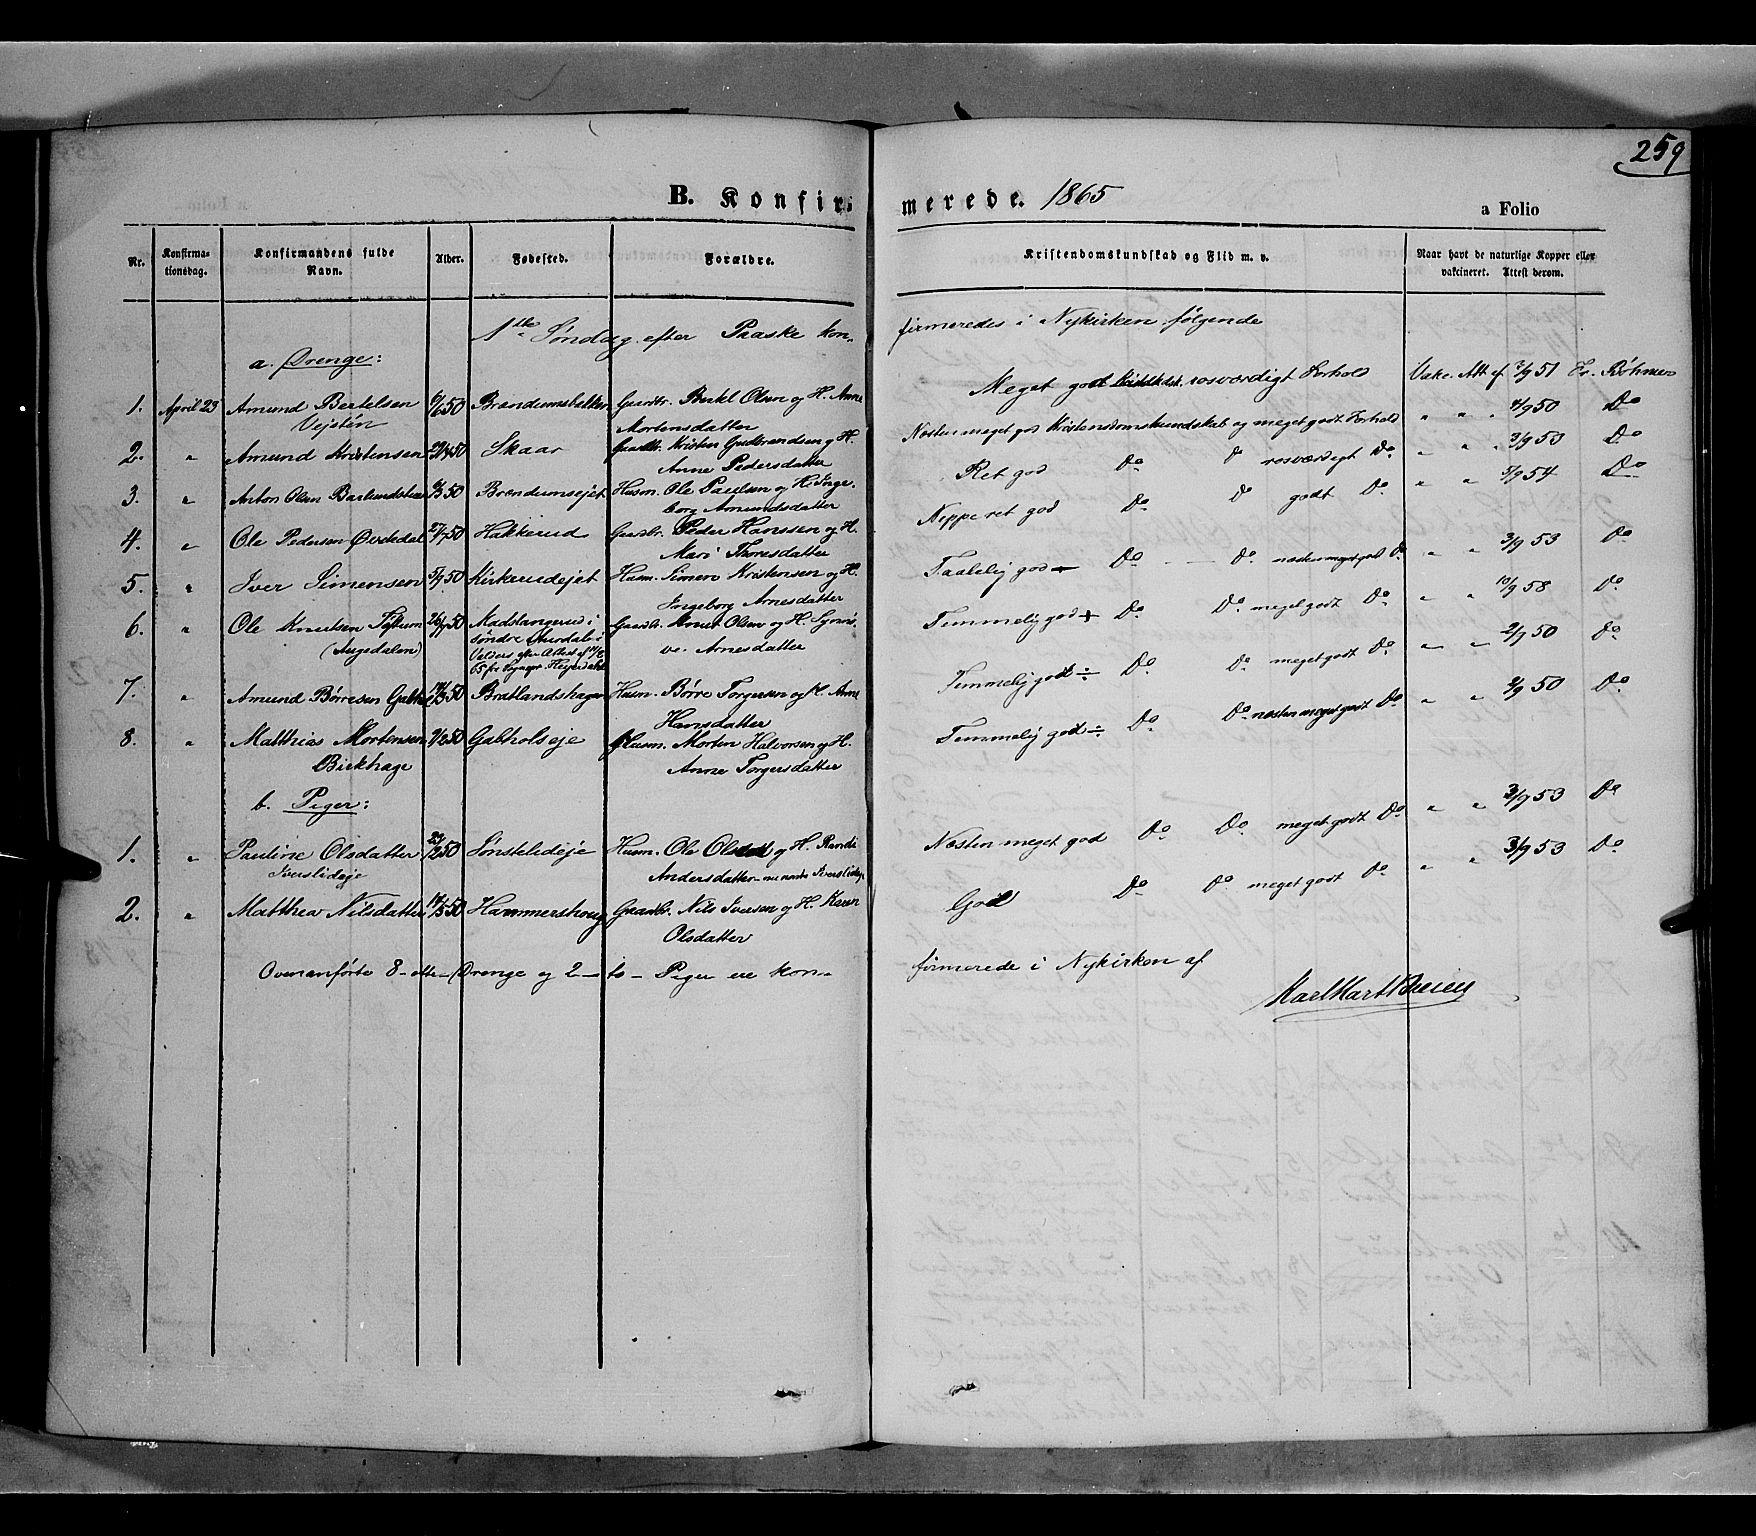 SAH, Gausdal prestekontor, Ministerialbok nr. 9, 1862-1873, s. 259